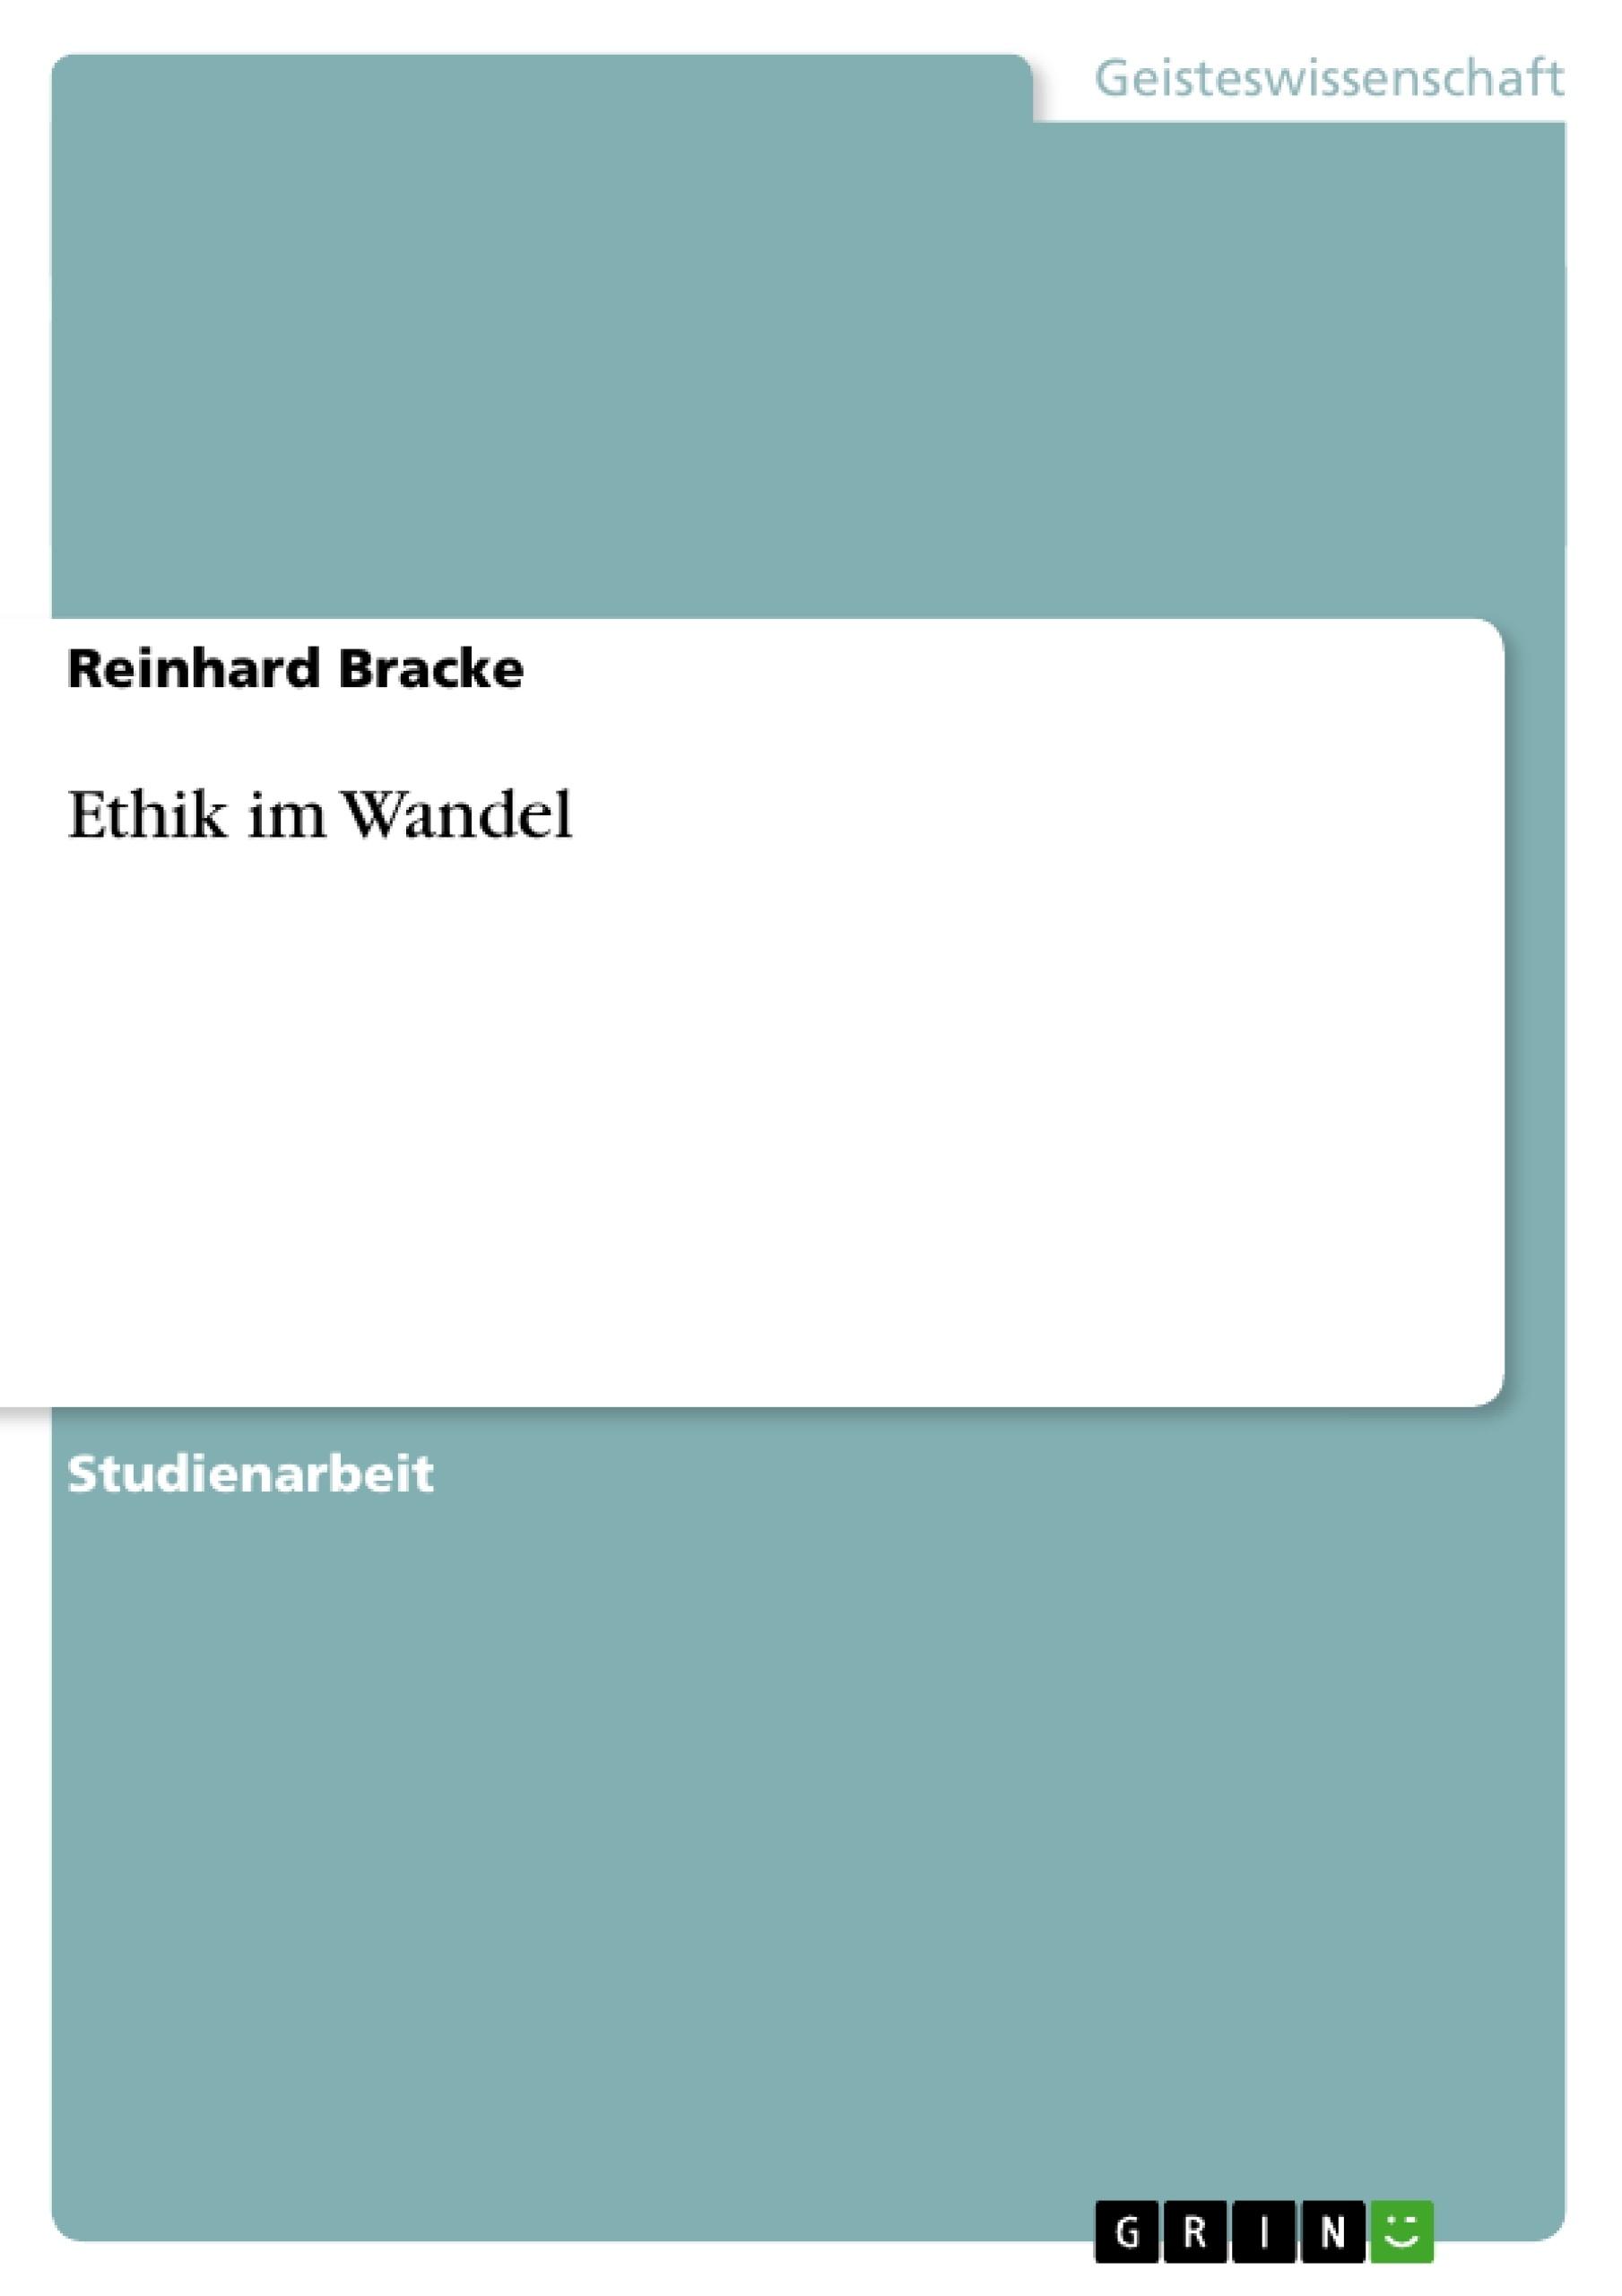 Titel: Ethik im Wandel